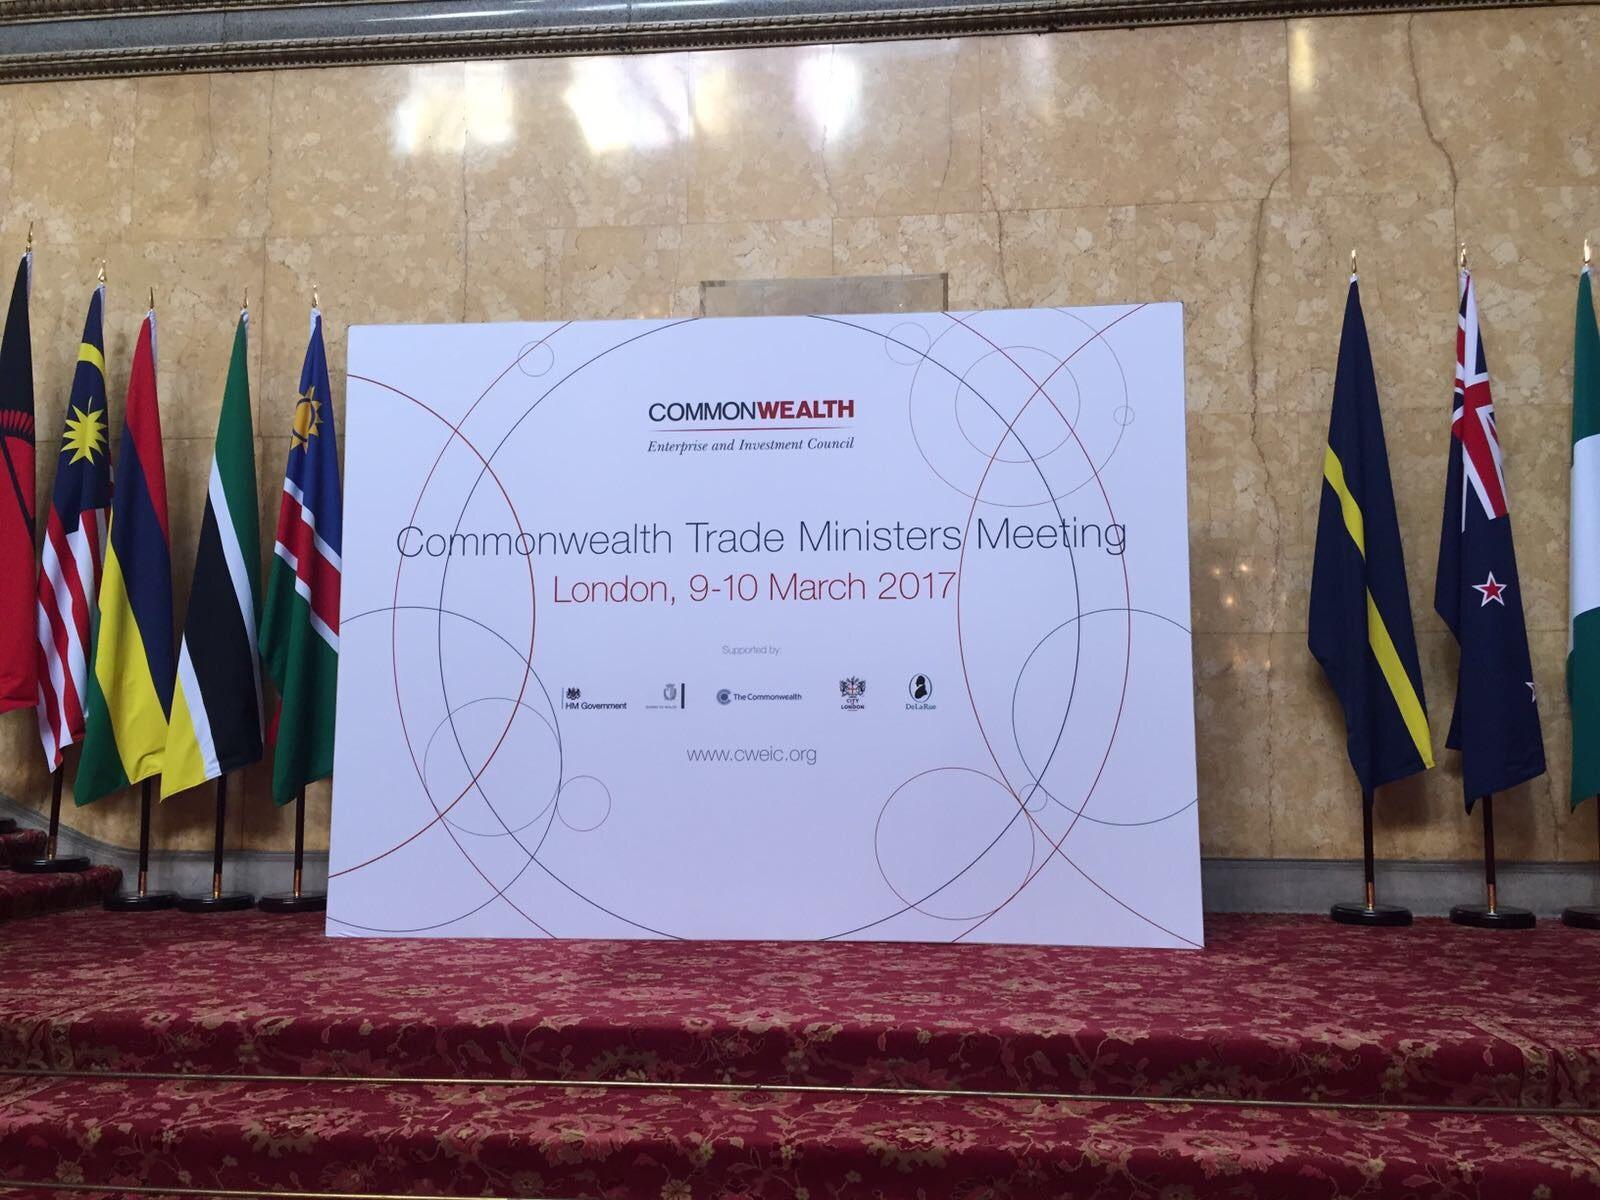 https://cdn2.hubspot.net/hubfs/2752422/Events/Commonwealth/Commonwealth2.jpg